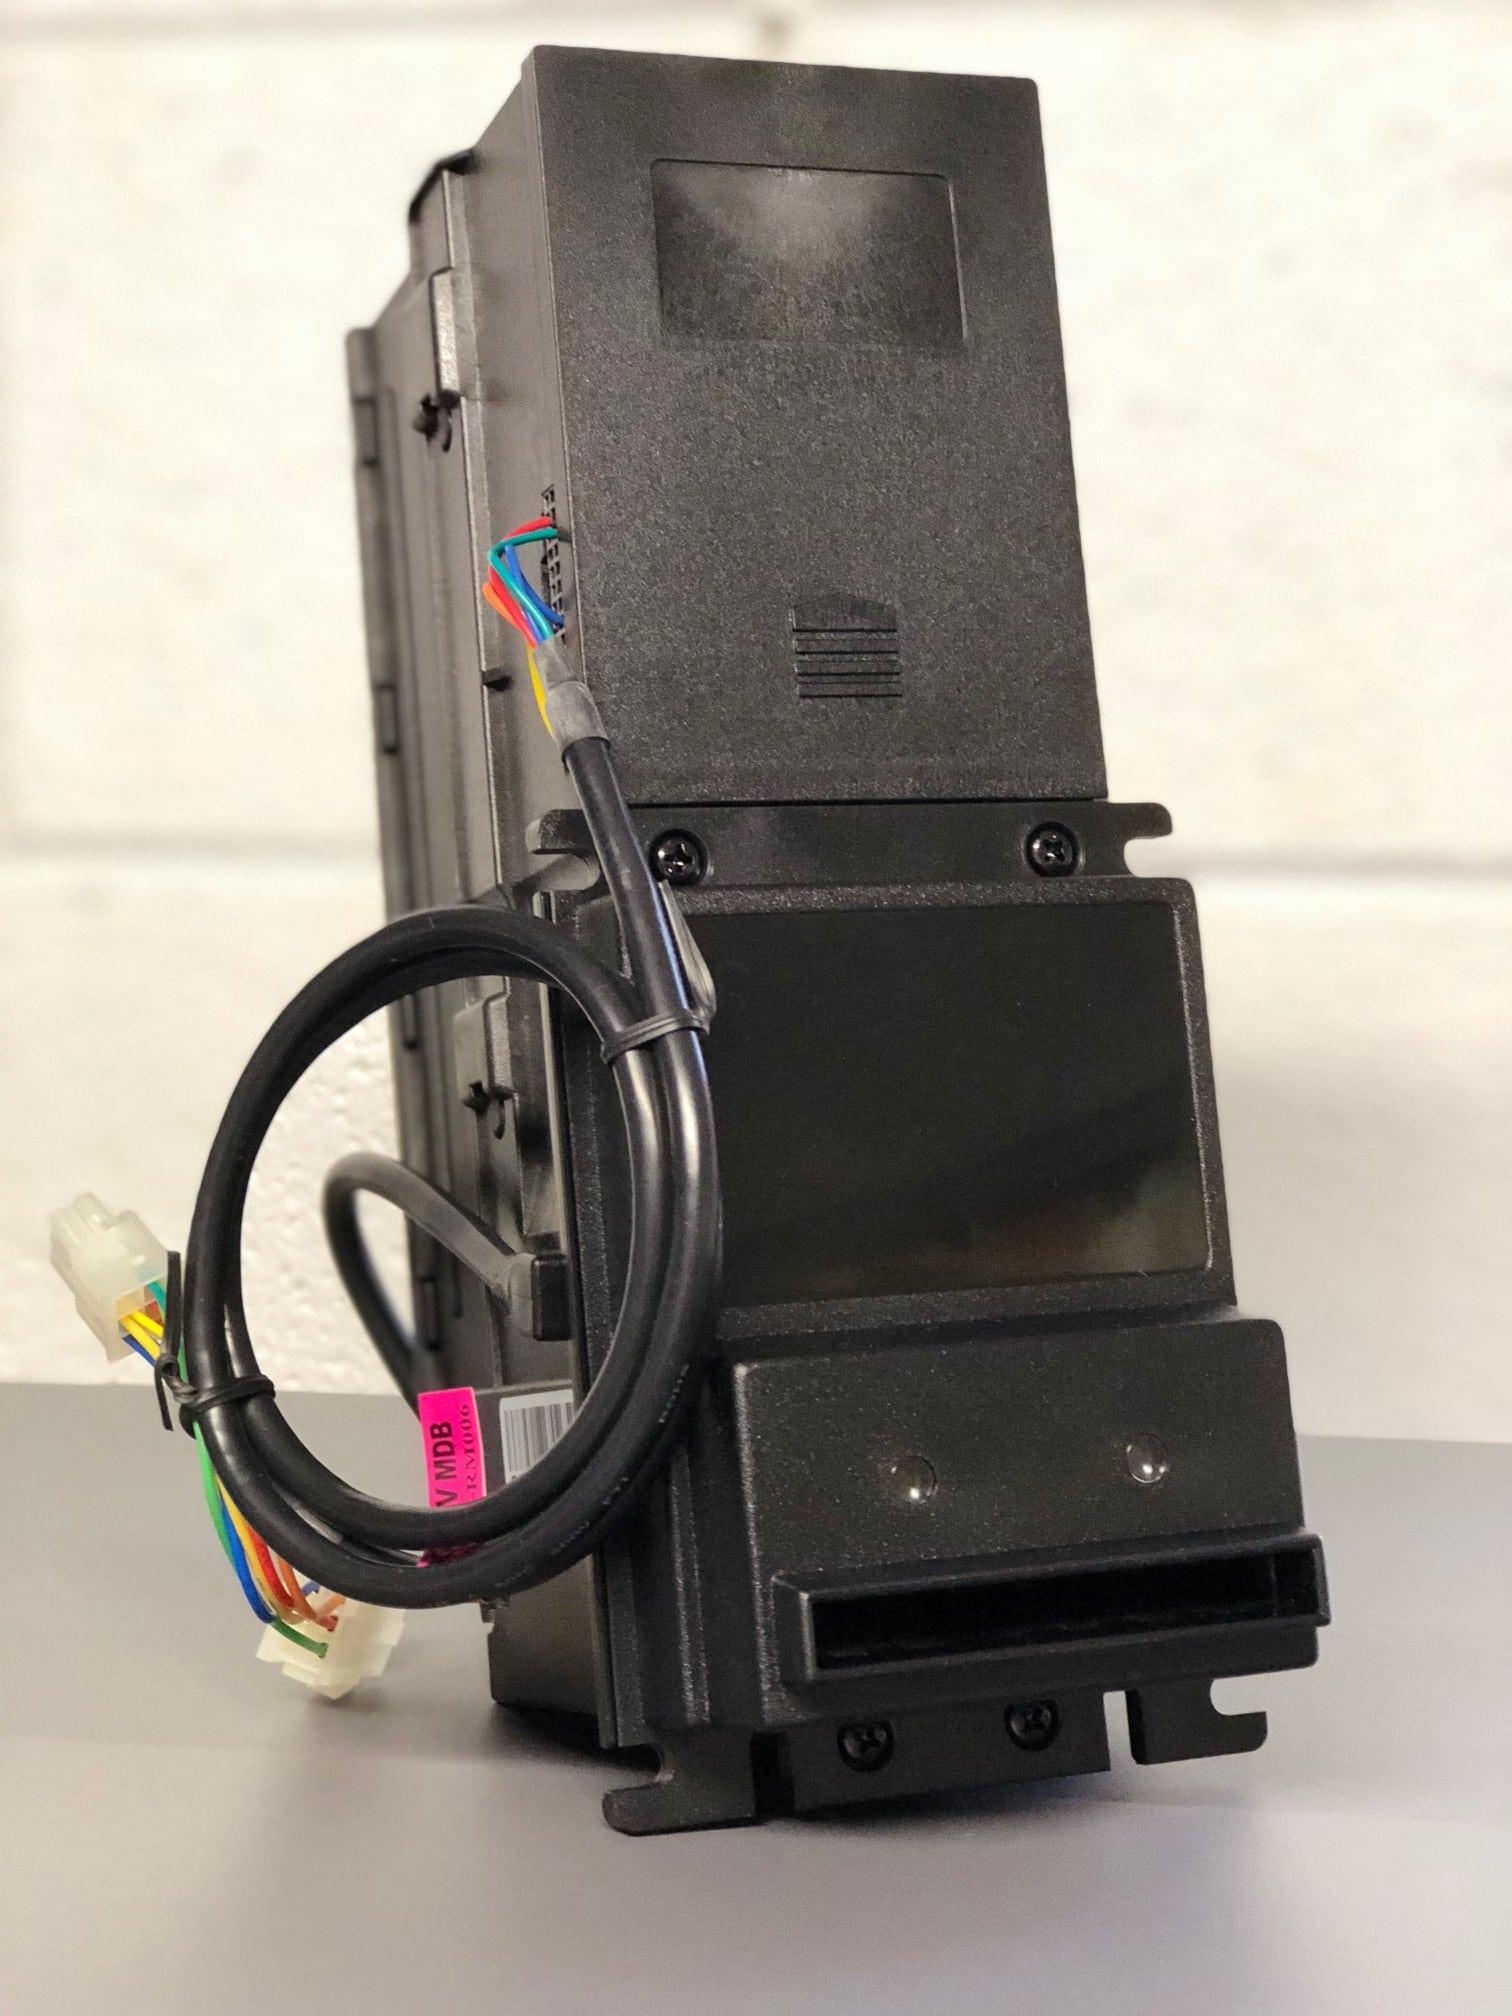 ICT V6 Bill Validator for a Vending Machine Photo